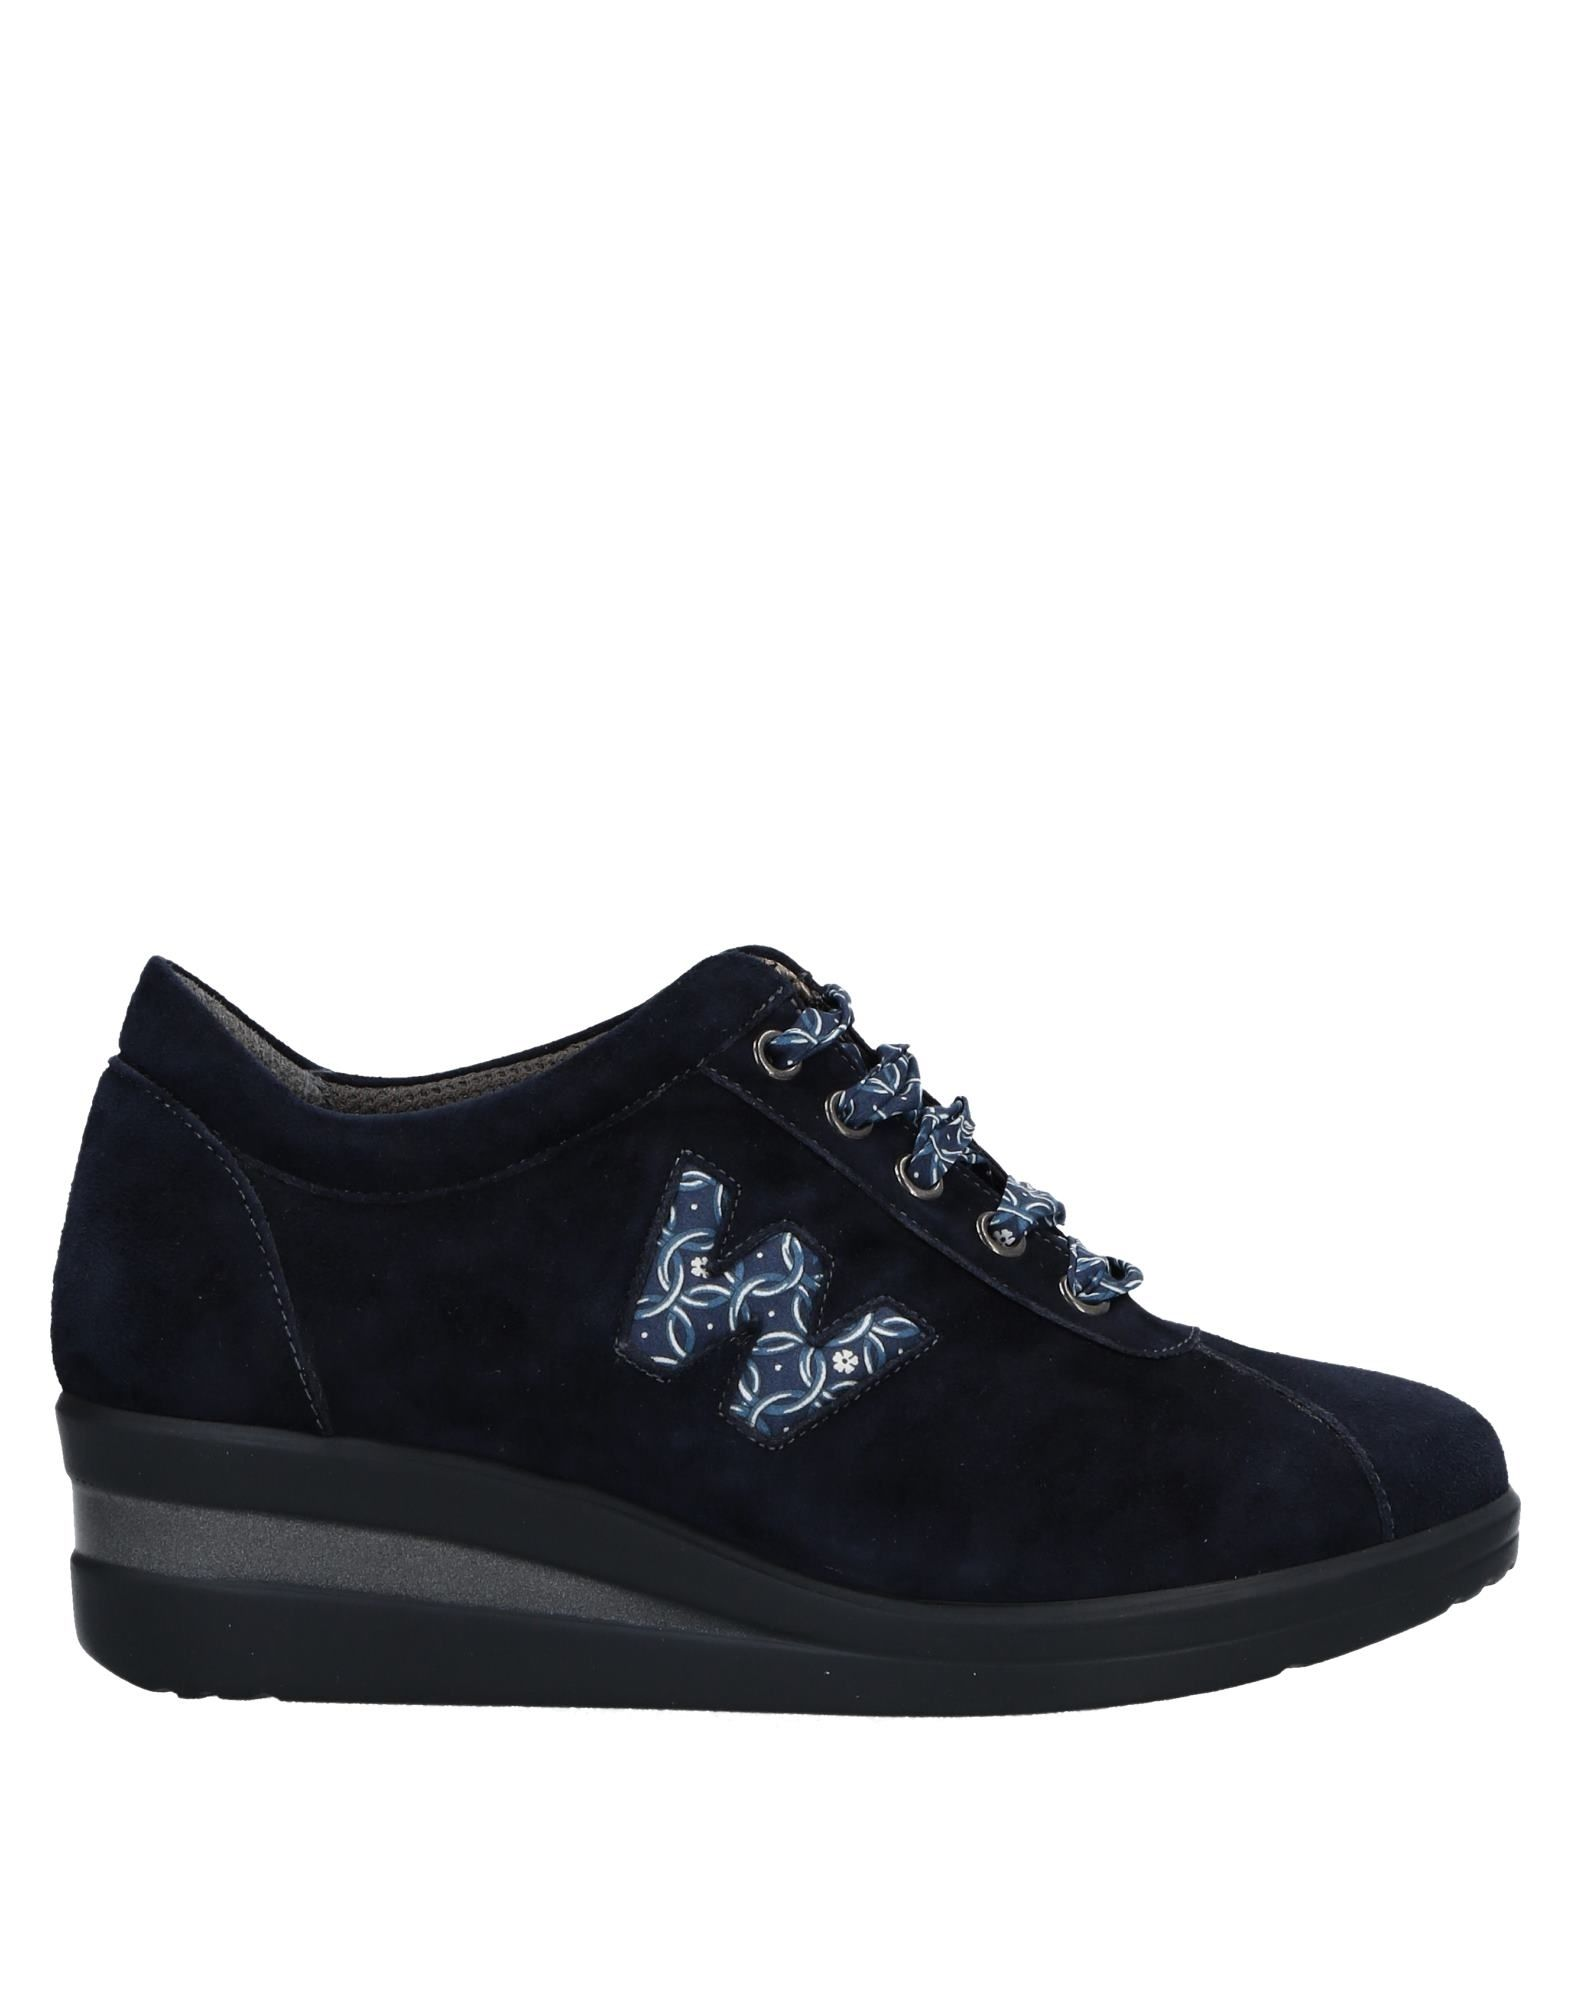 Walk 11534847MA By Melluso Sneakers Damen  11534847MA Walk Gute Qualität beliebte Schuhe 374f44